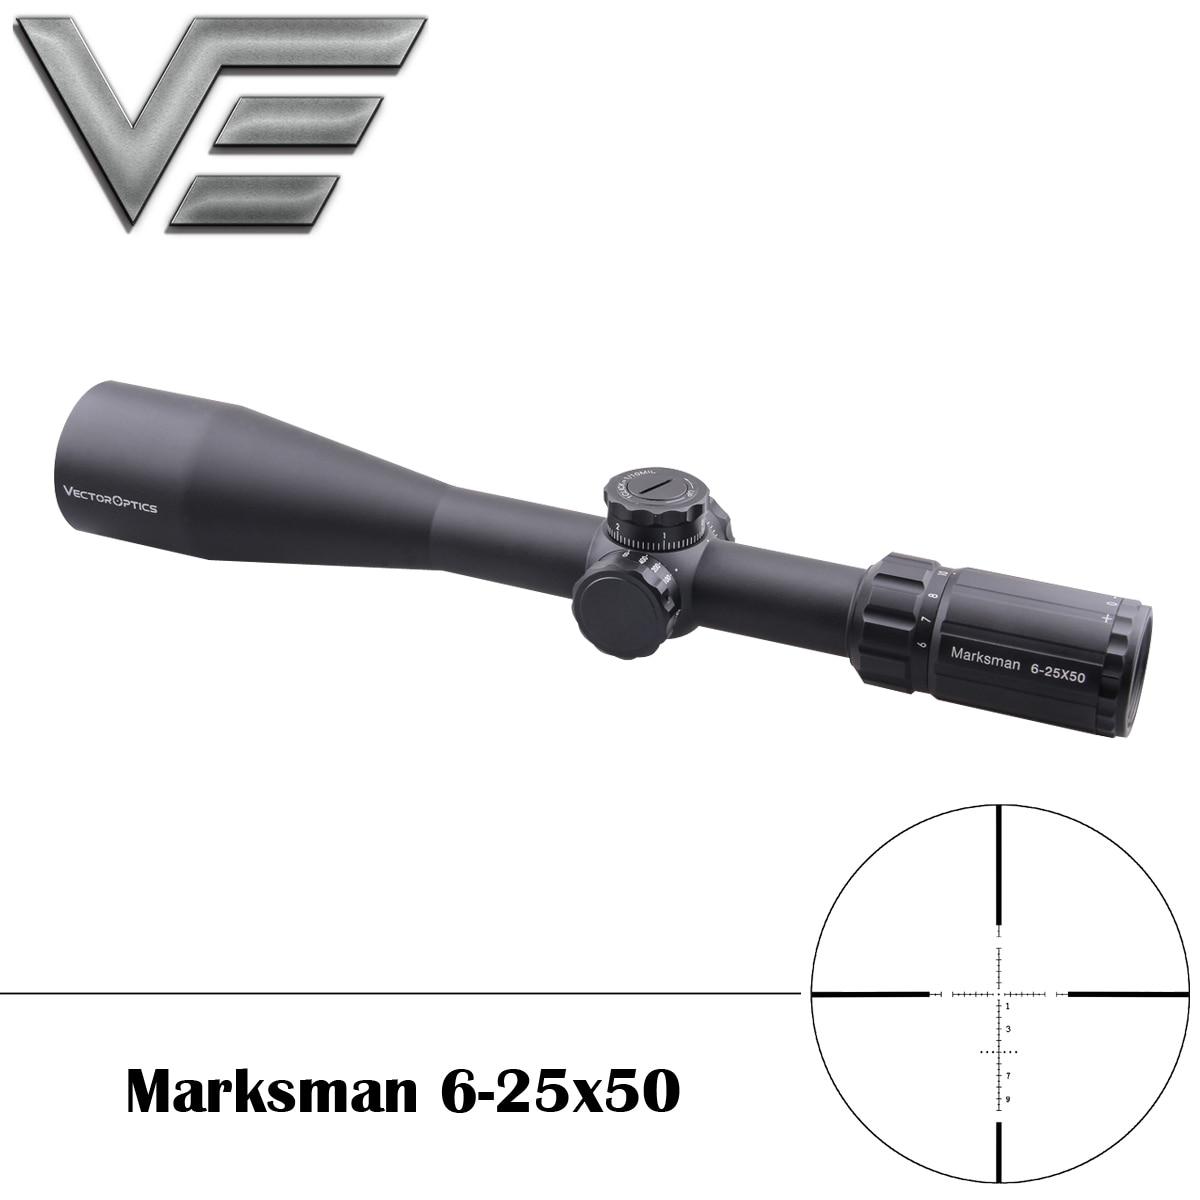 Vector Optics Marksman 6 25x50 Tactical Gun Rifle Scope MPT1 Reticle Low Turret 1 10 MIL